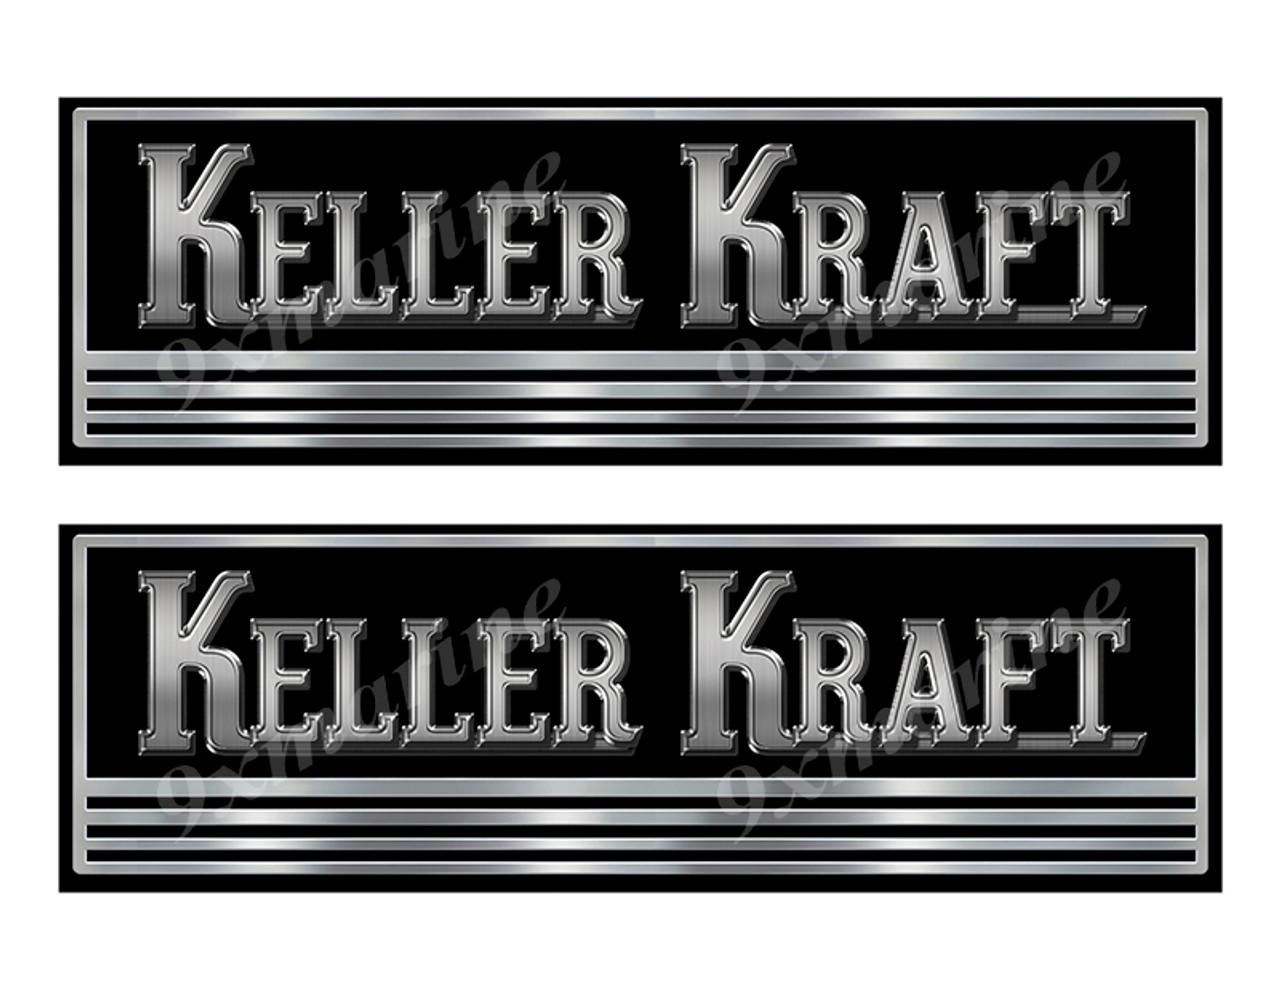 Keller Kraft boat Custom Stickers - 10 inch long set. Remastered Name Plate